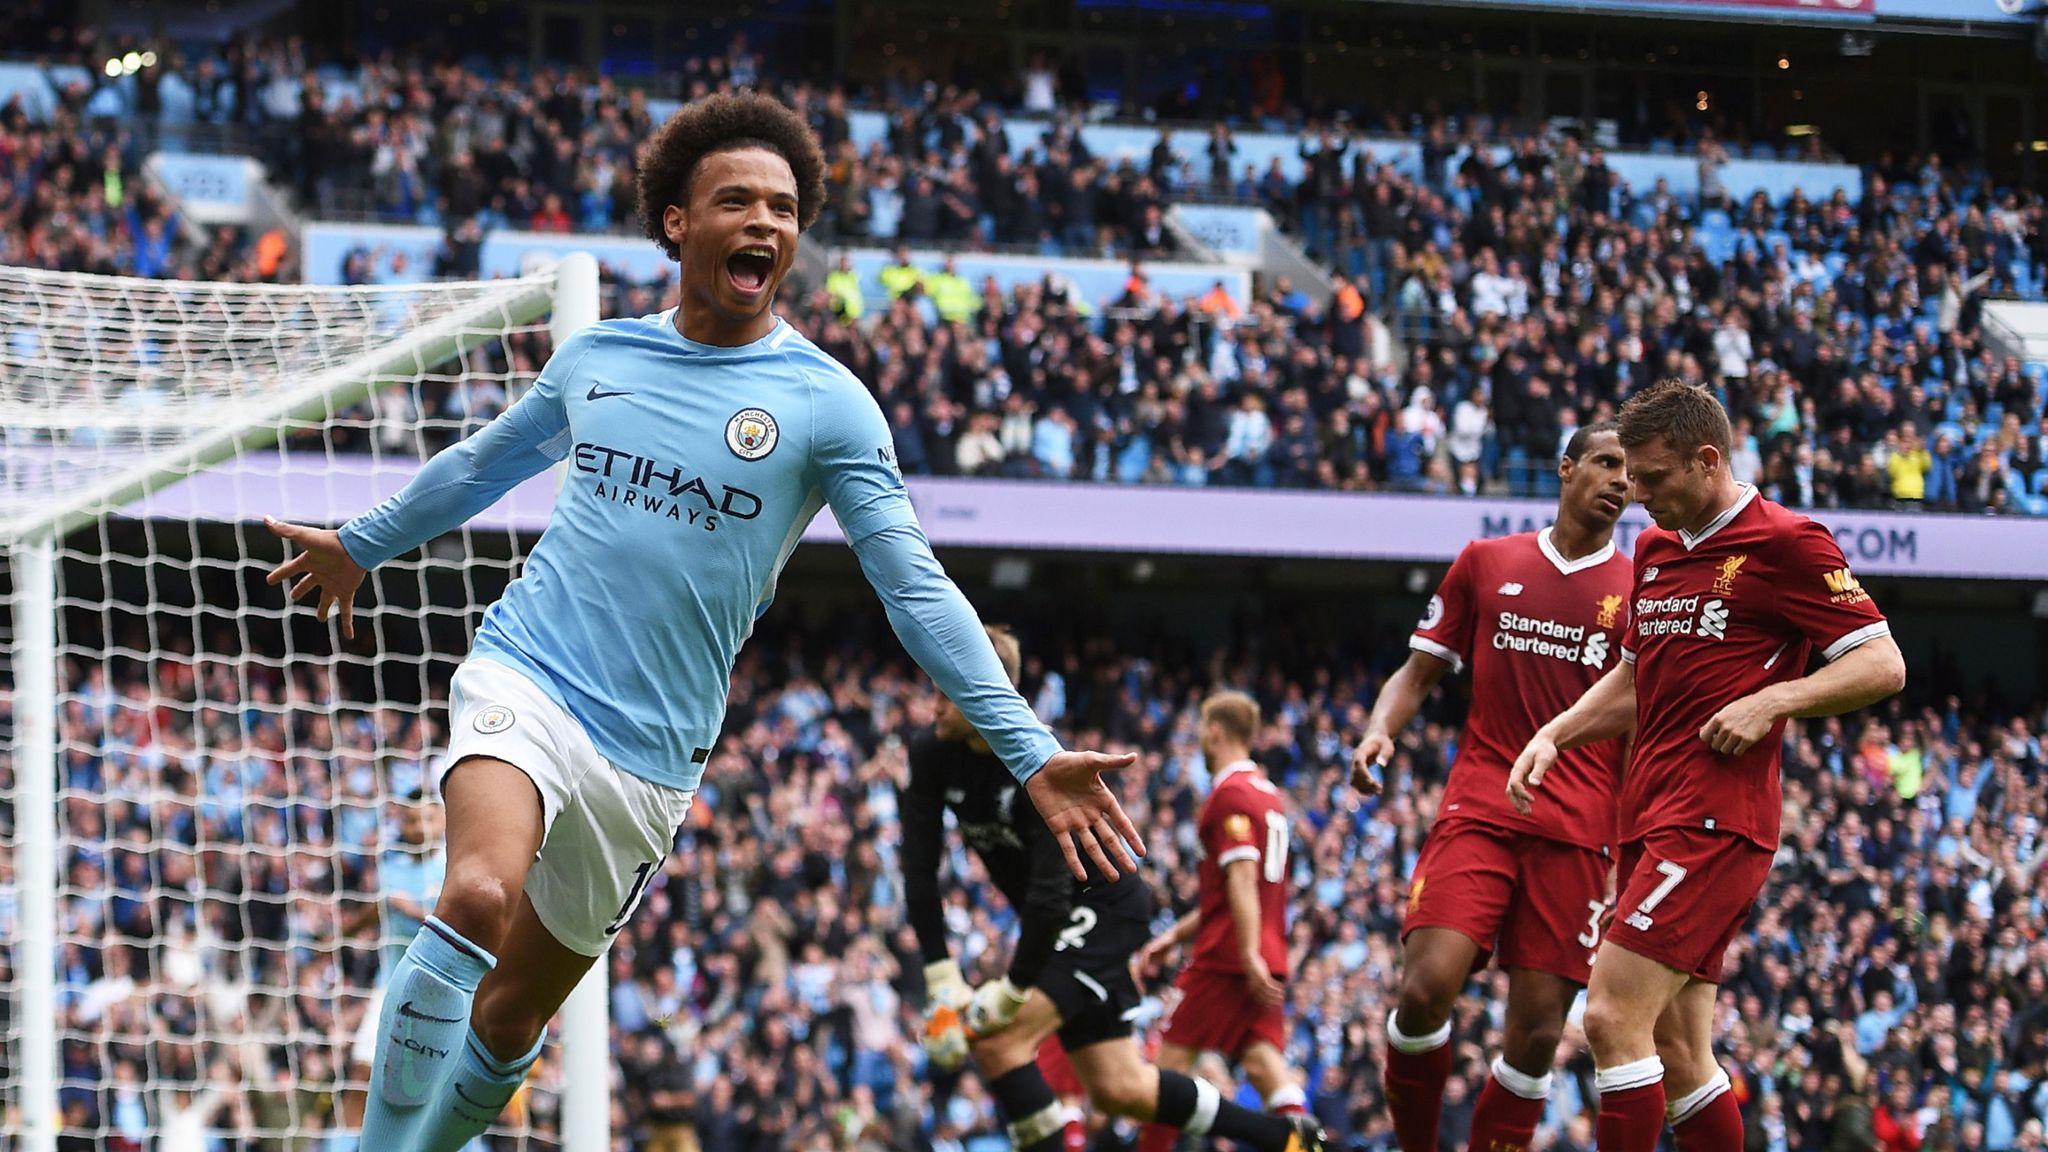 Manchester City 5-0 Liverpool: Jurgen Klopp's side suffer after Sadio  Mane's red card   Football News